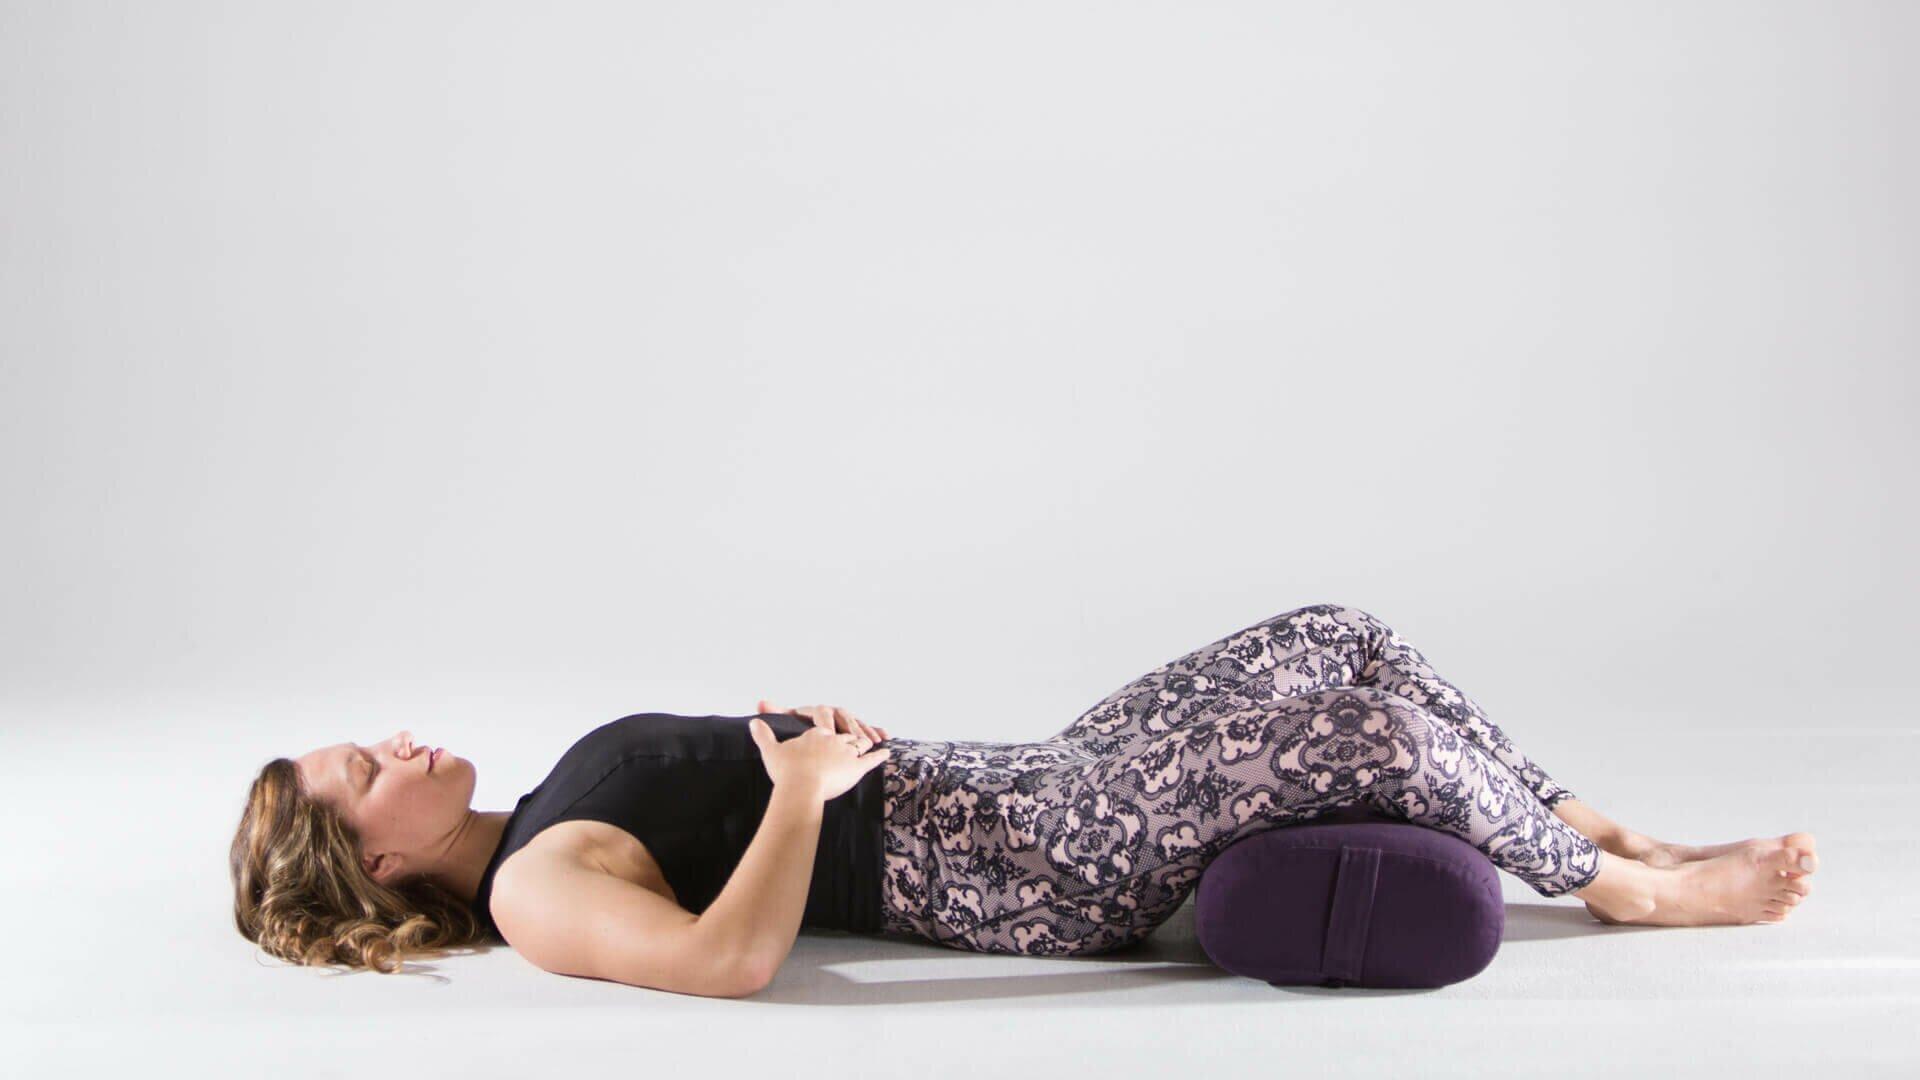 postura-borboleta-reclinada-yogateria